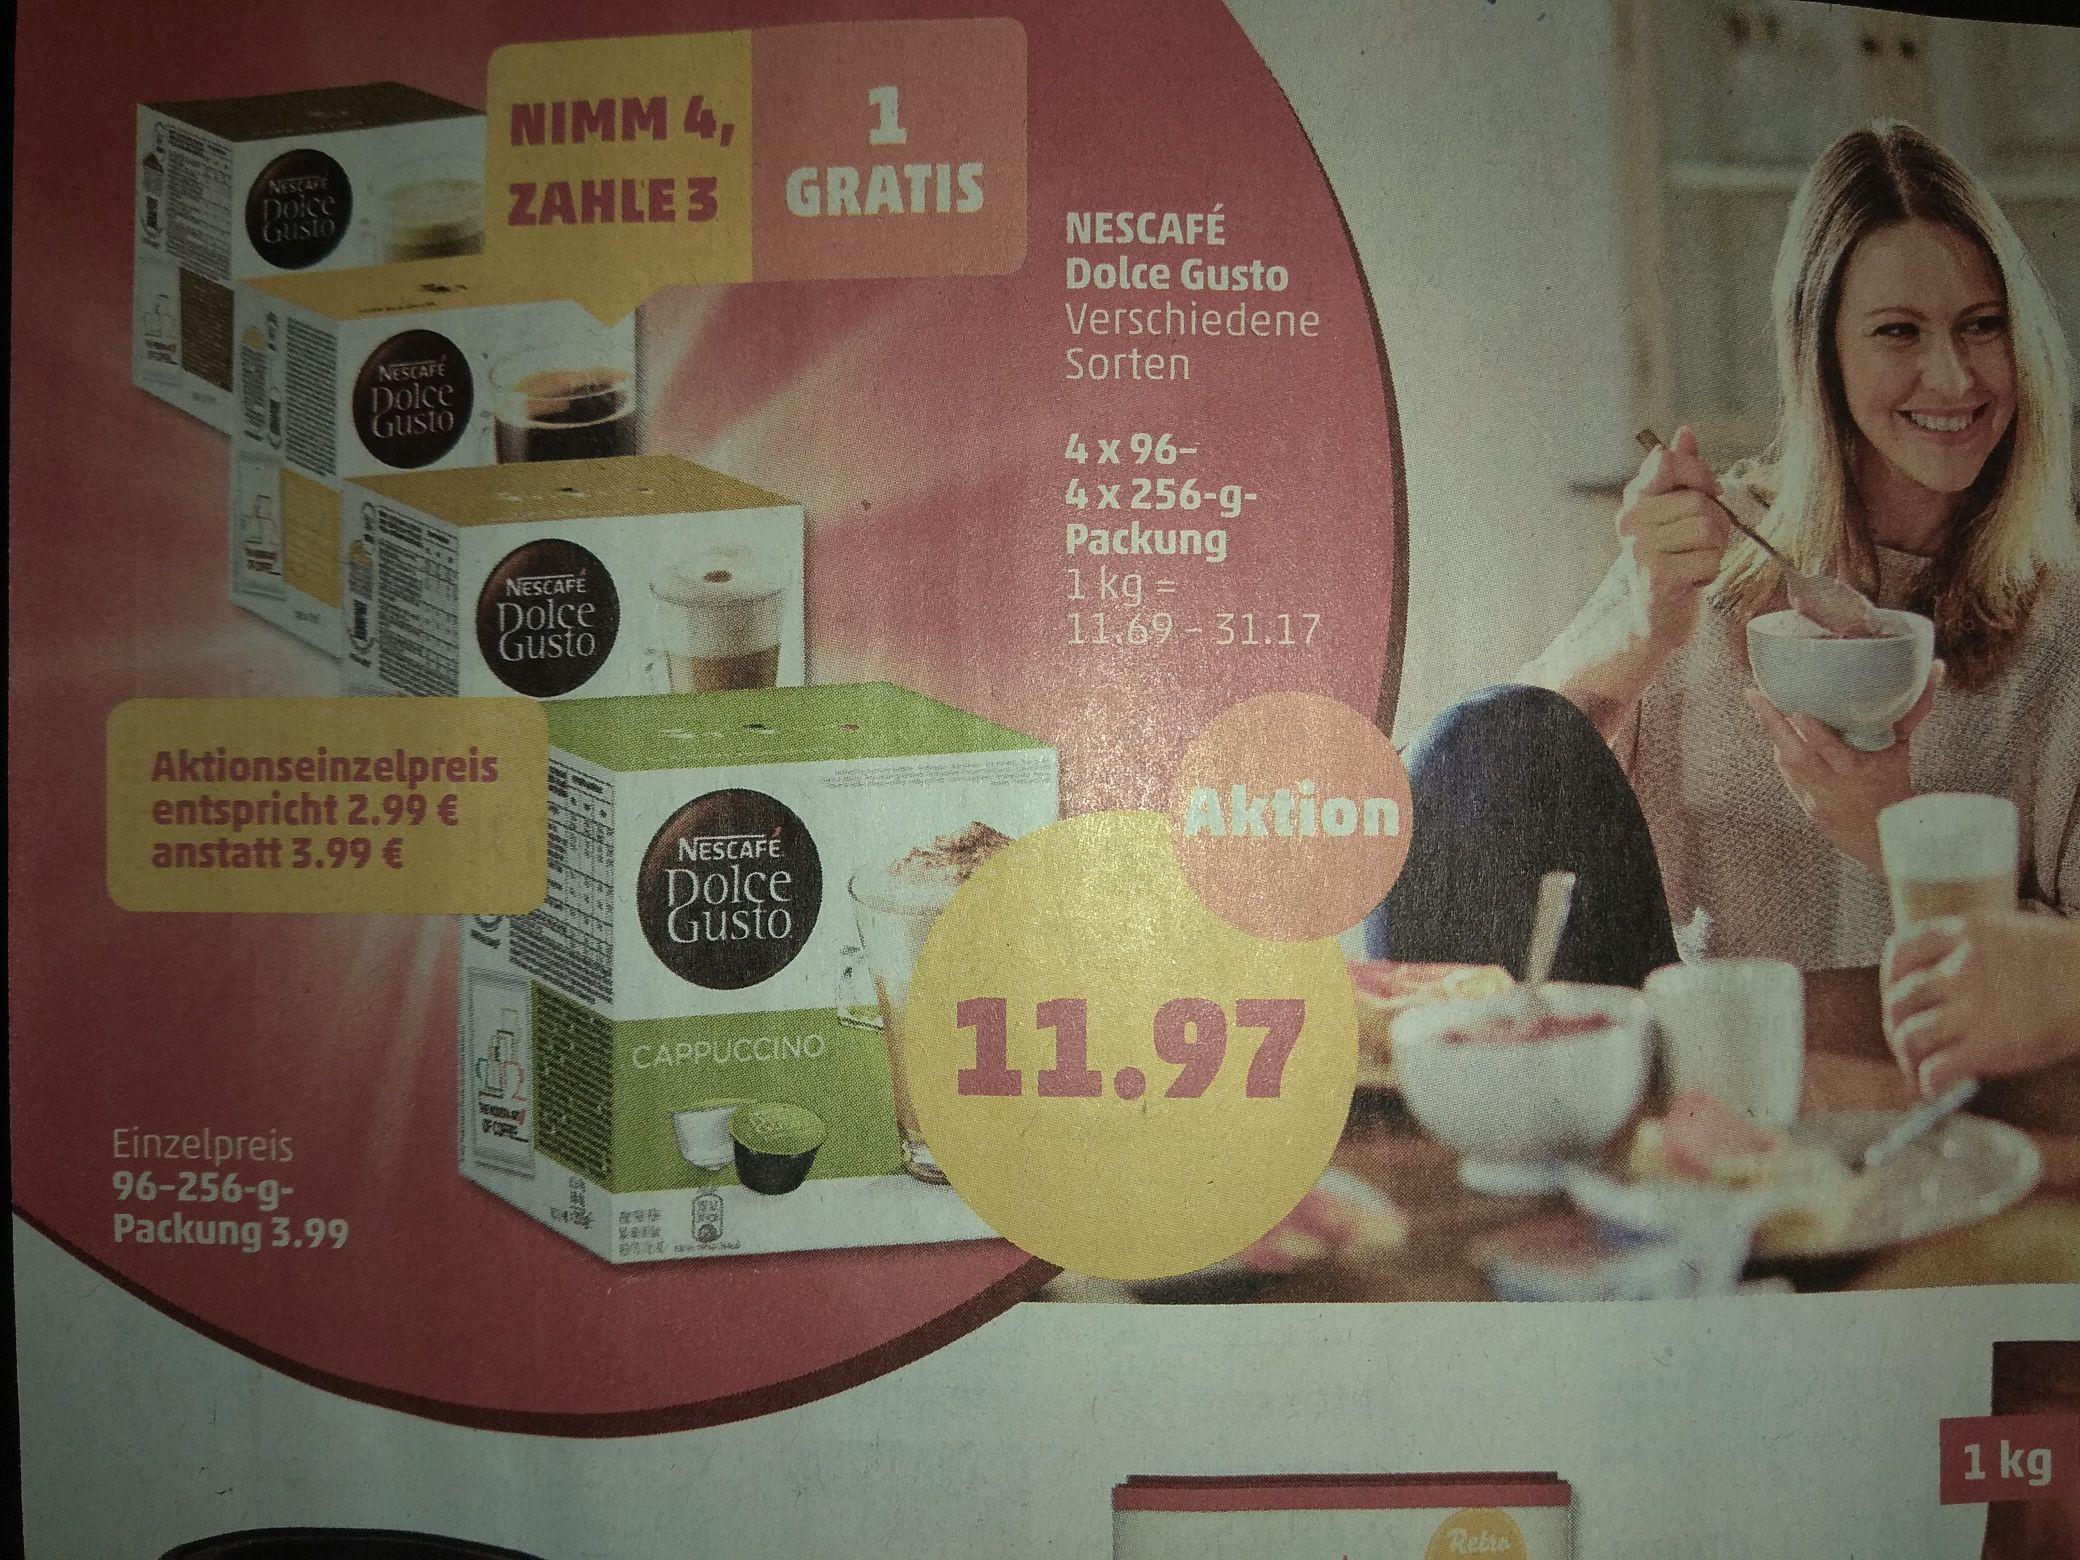 [Penny] Dolce Gusto Kaffeekapseln 4 für 3. Stückpreis 2,99€!